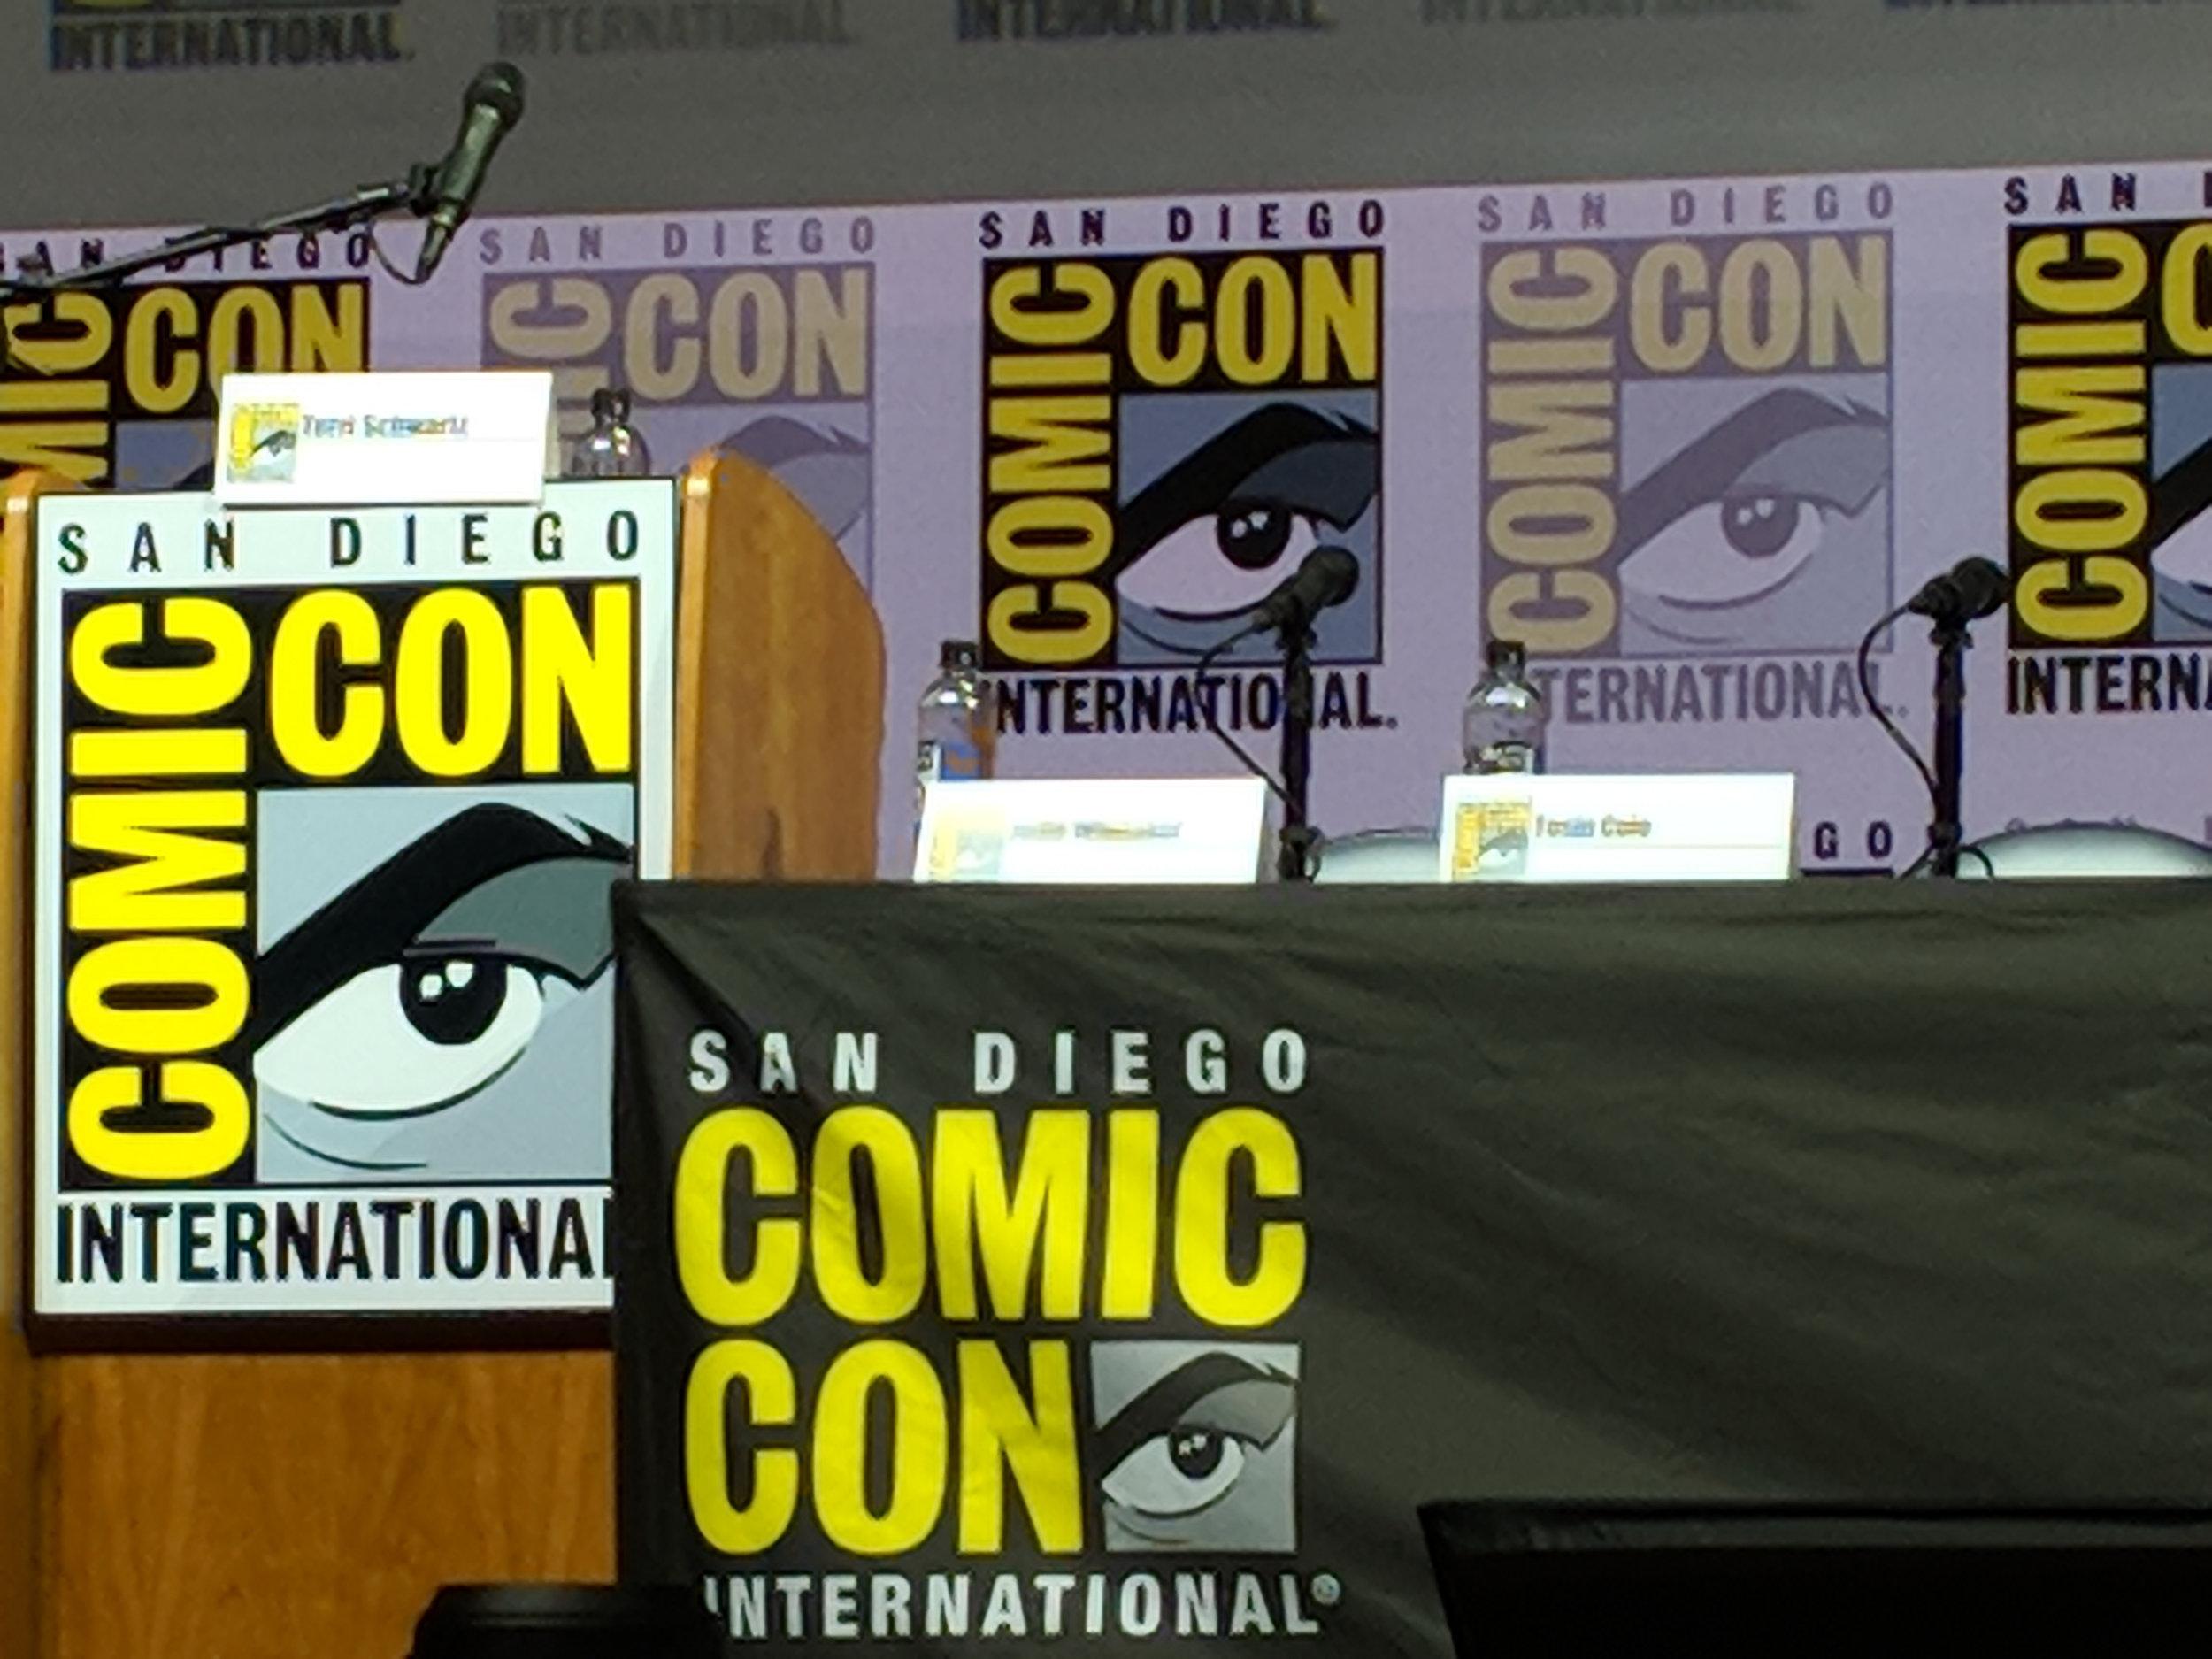 SABMG SDCC San Diego Comiccon banners.jpg